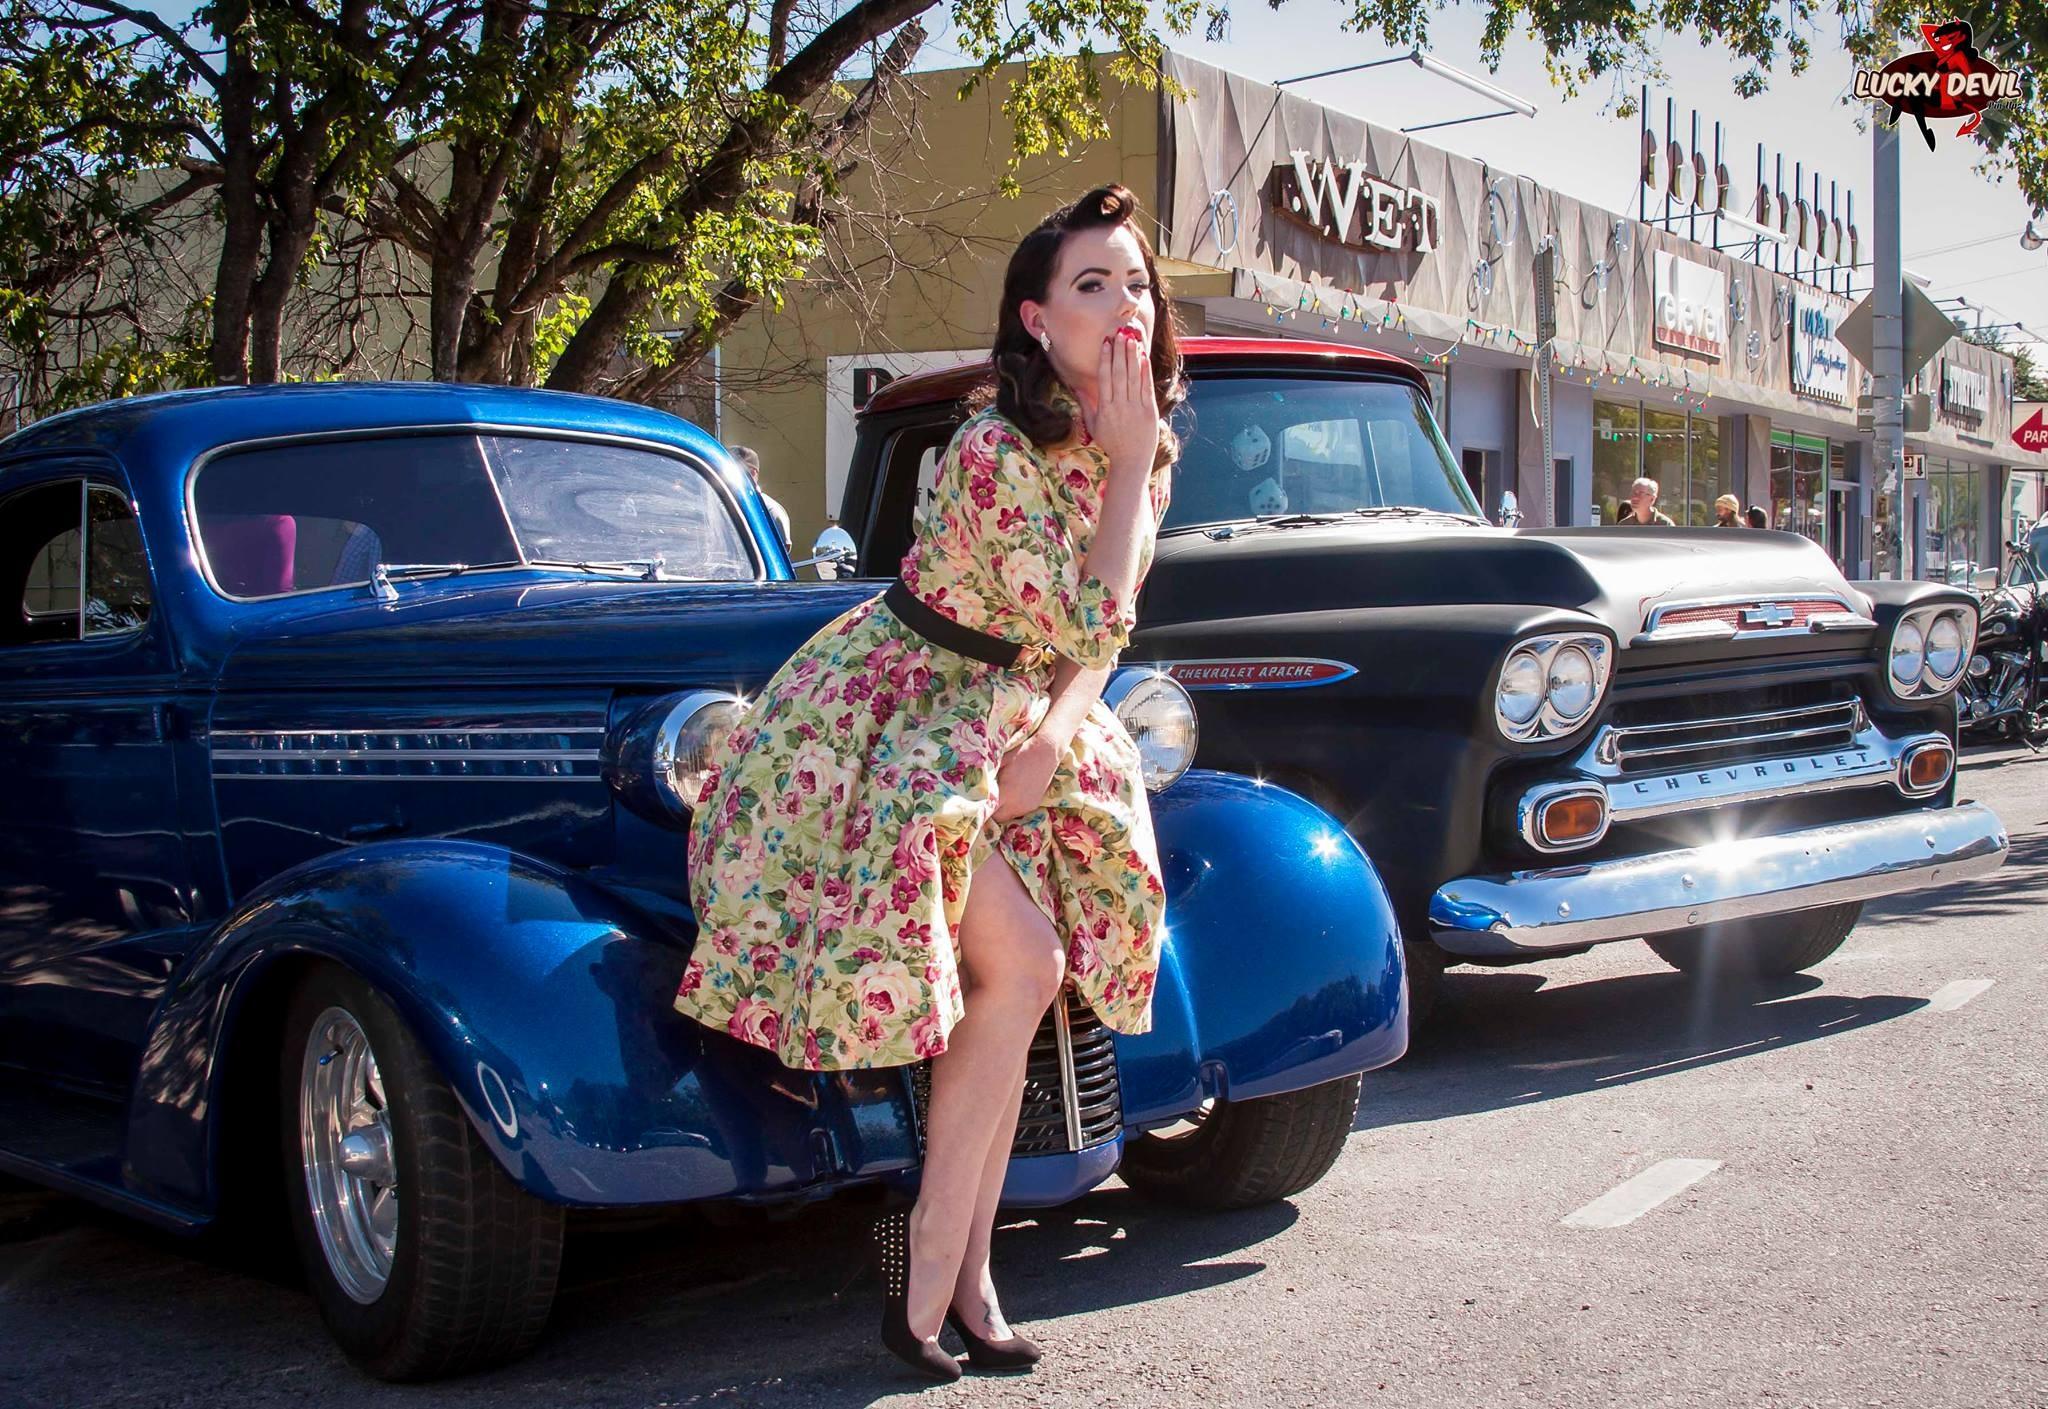 fond d 39 cran femmes maquette voitures bleues urbain robe femmes avec des voitures. Black Bedroom Furniture Sets. Home Design Ideas